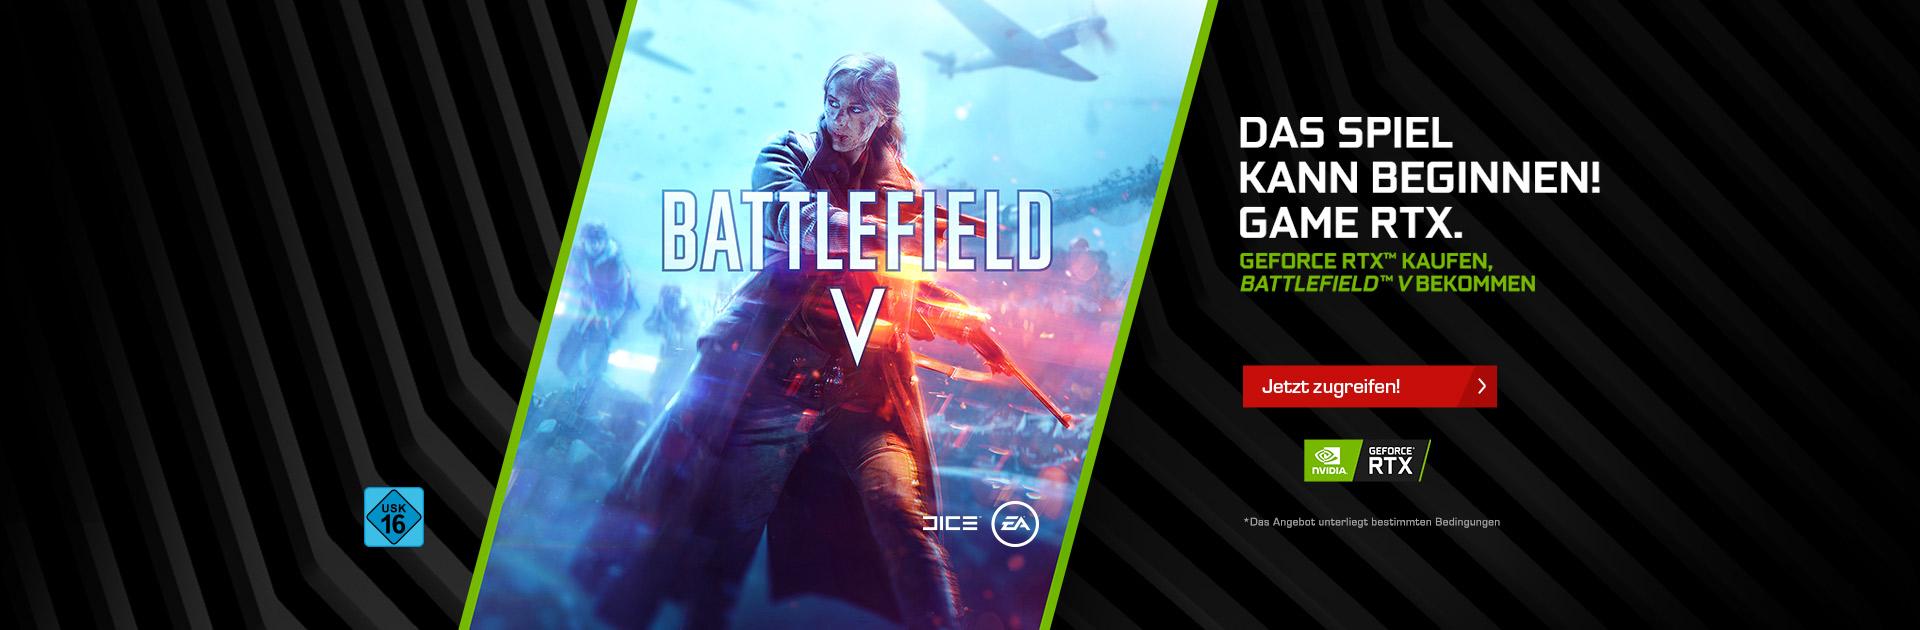 NVIDIA RTX Game Bundle Battlefield V